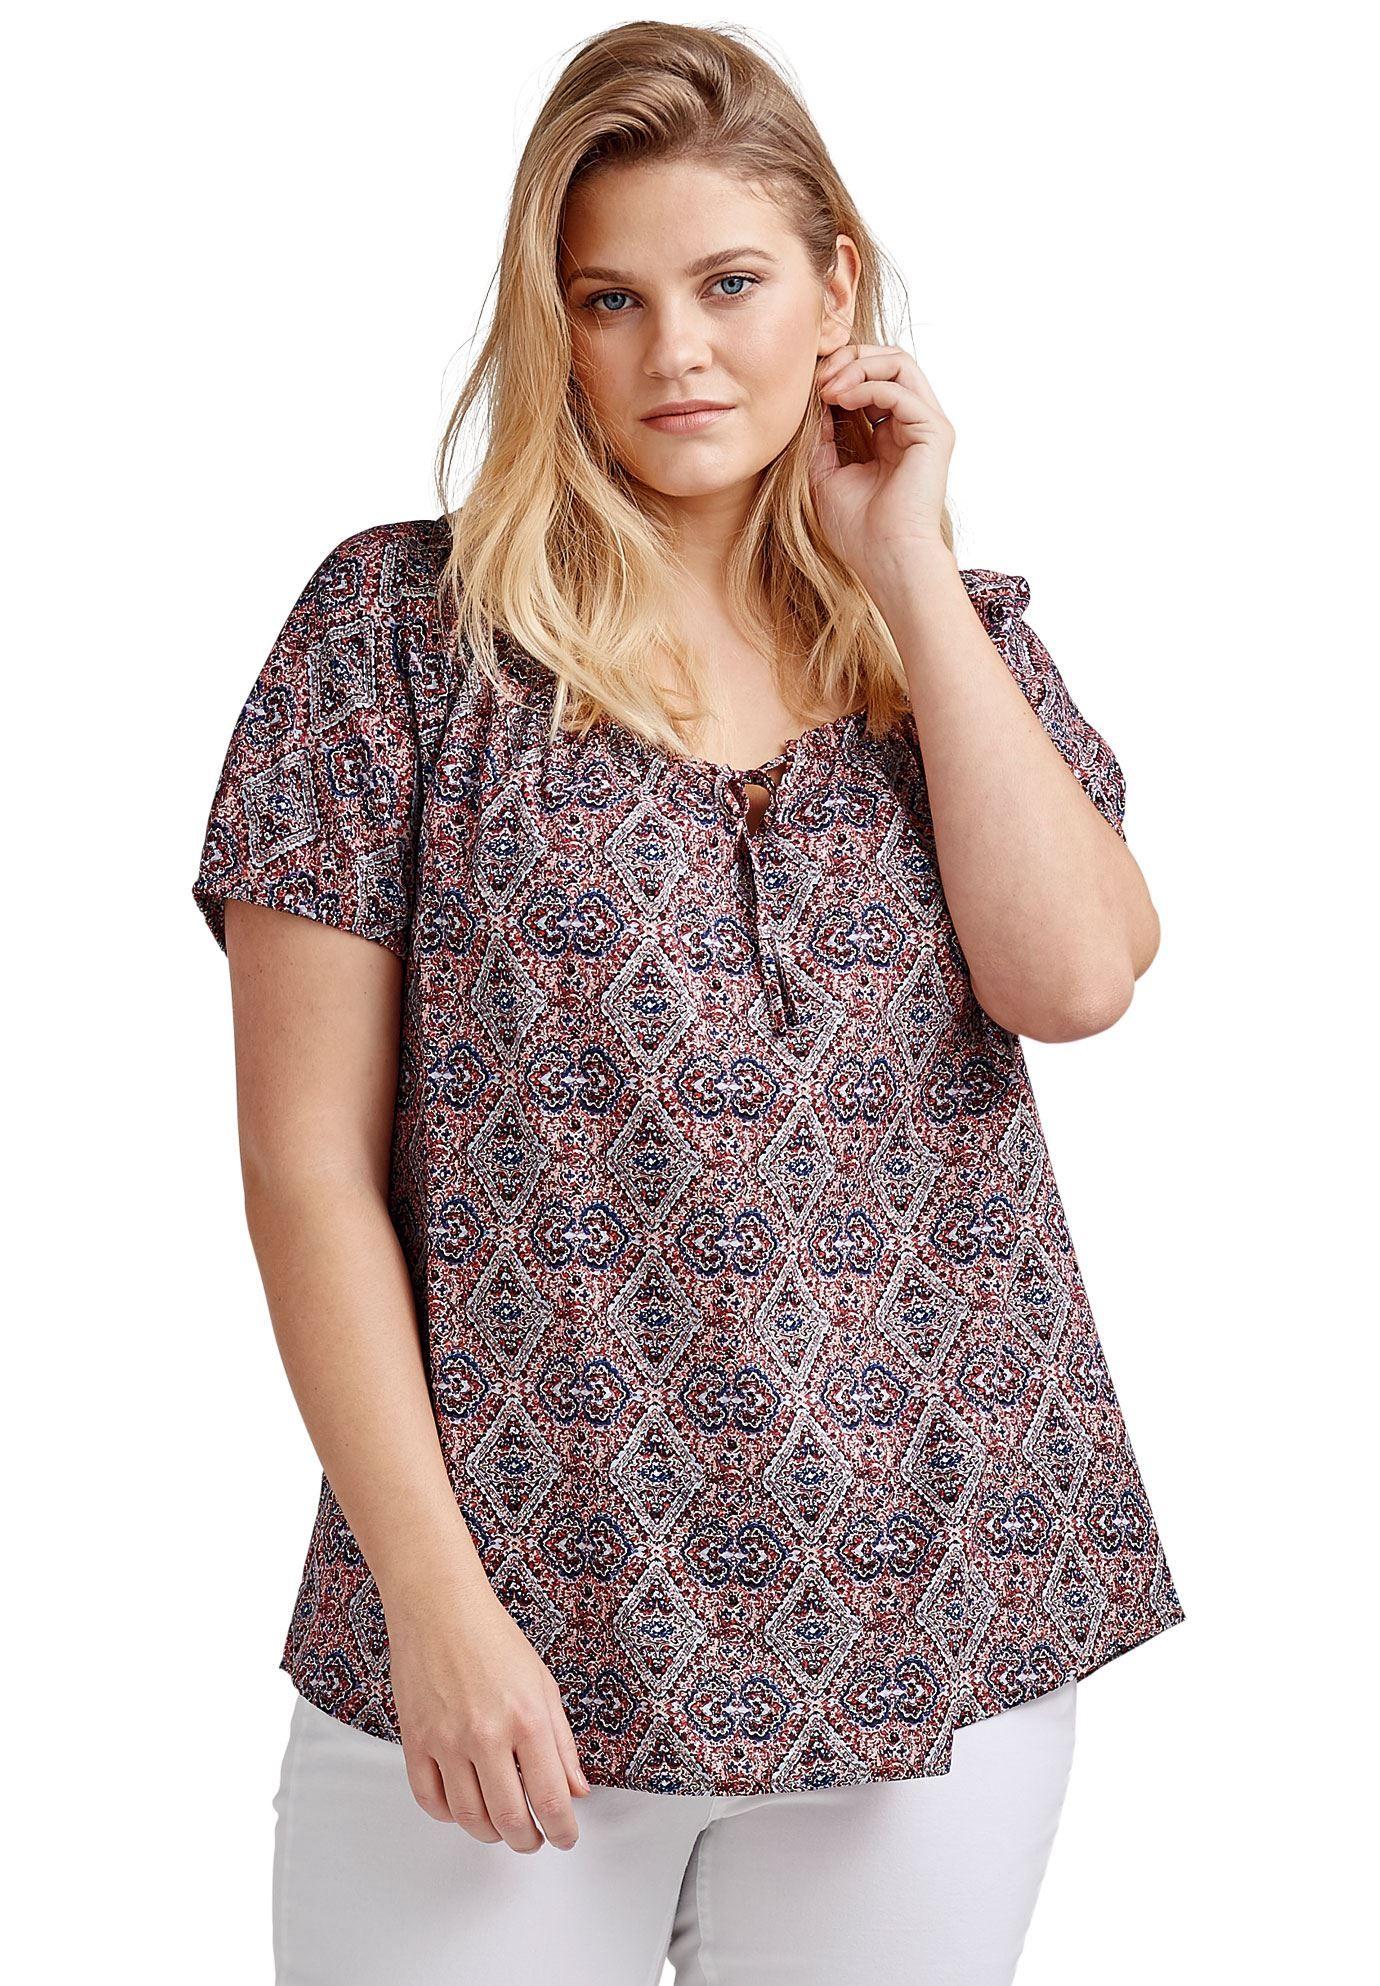 f9e9ff5389d Products · Keyhole Neckline Peasant Blouse by ellos - Women s Plus Size  Clothing